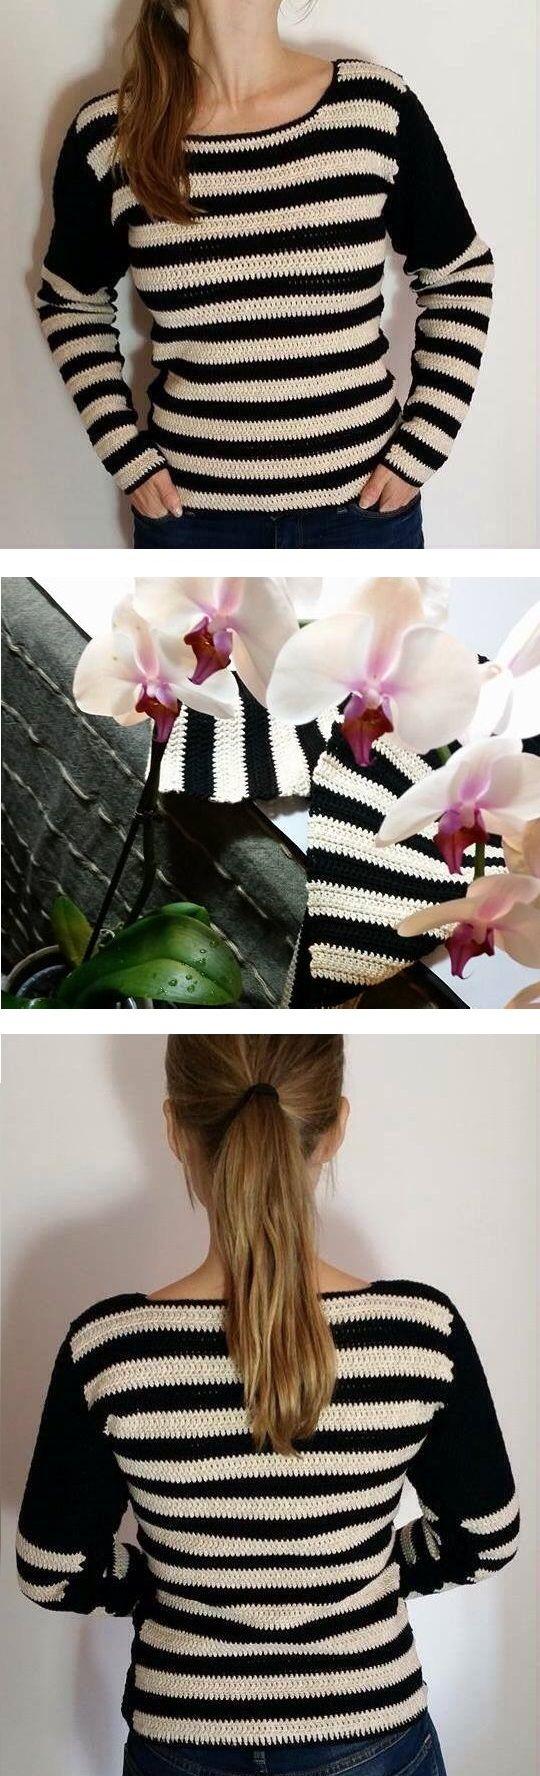 Crochet Pattern for Striped Shirt / Pullover